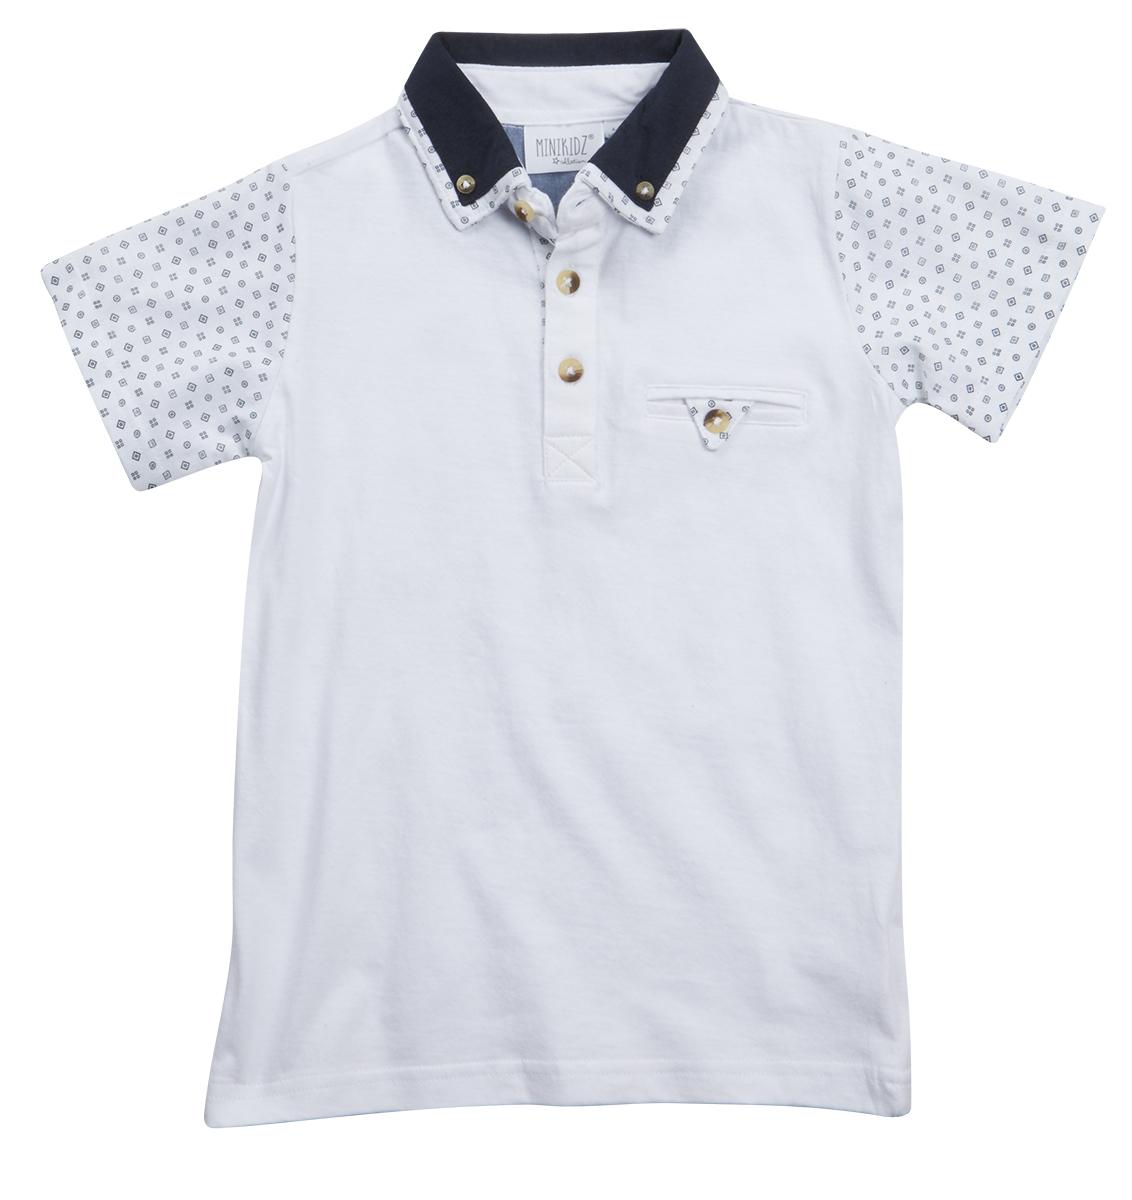 Boys polo shirt t shirt summertop short sleeve button down for Boys short sleeve button down shirt